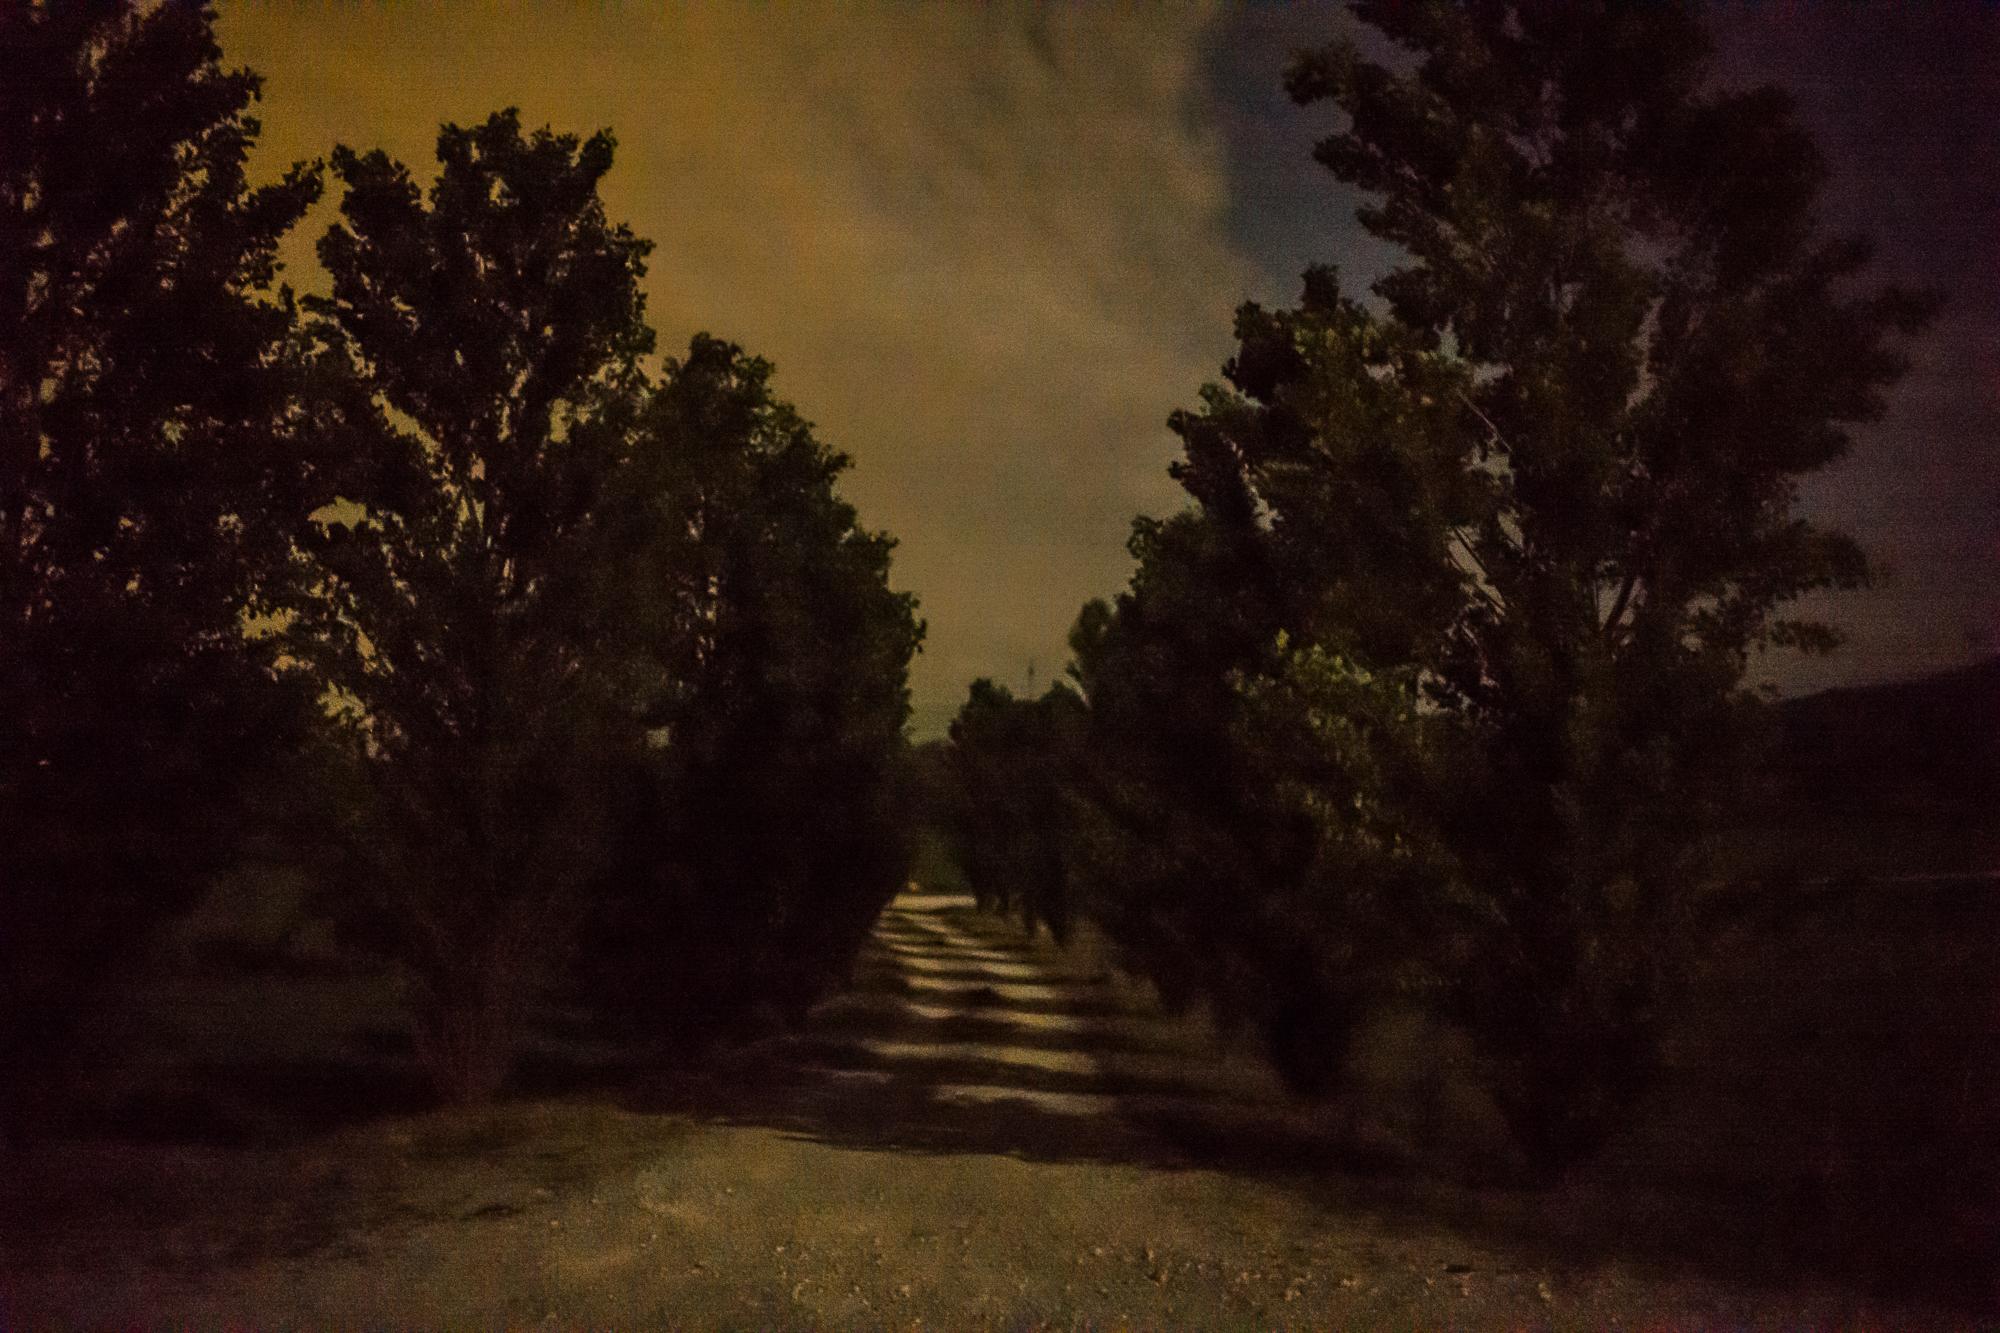 Villa driveway in moonlight